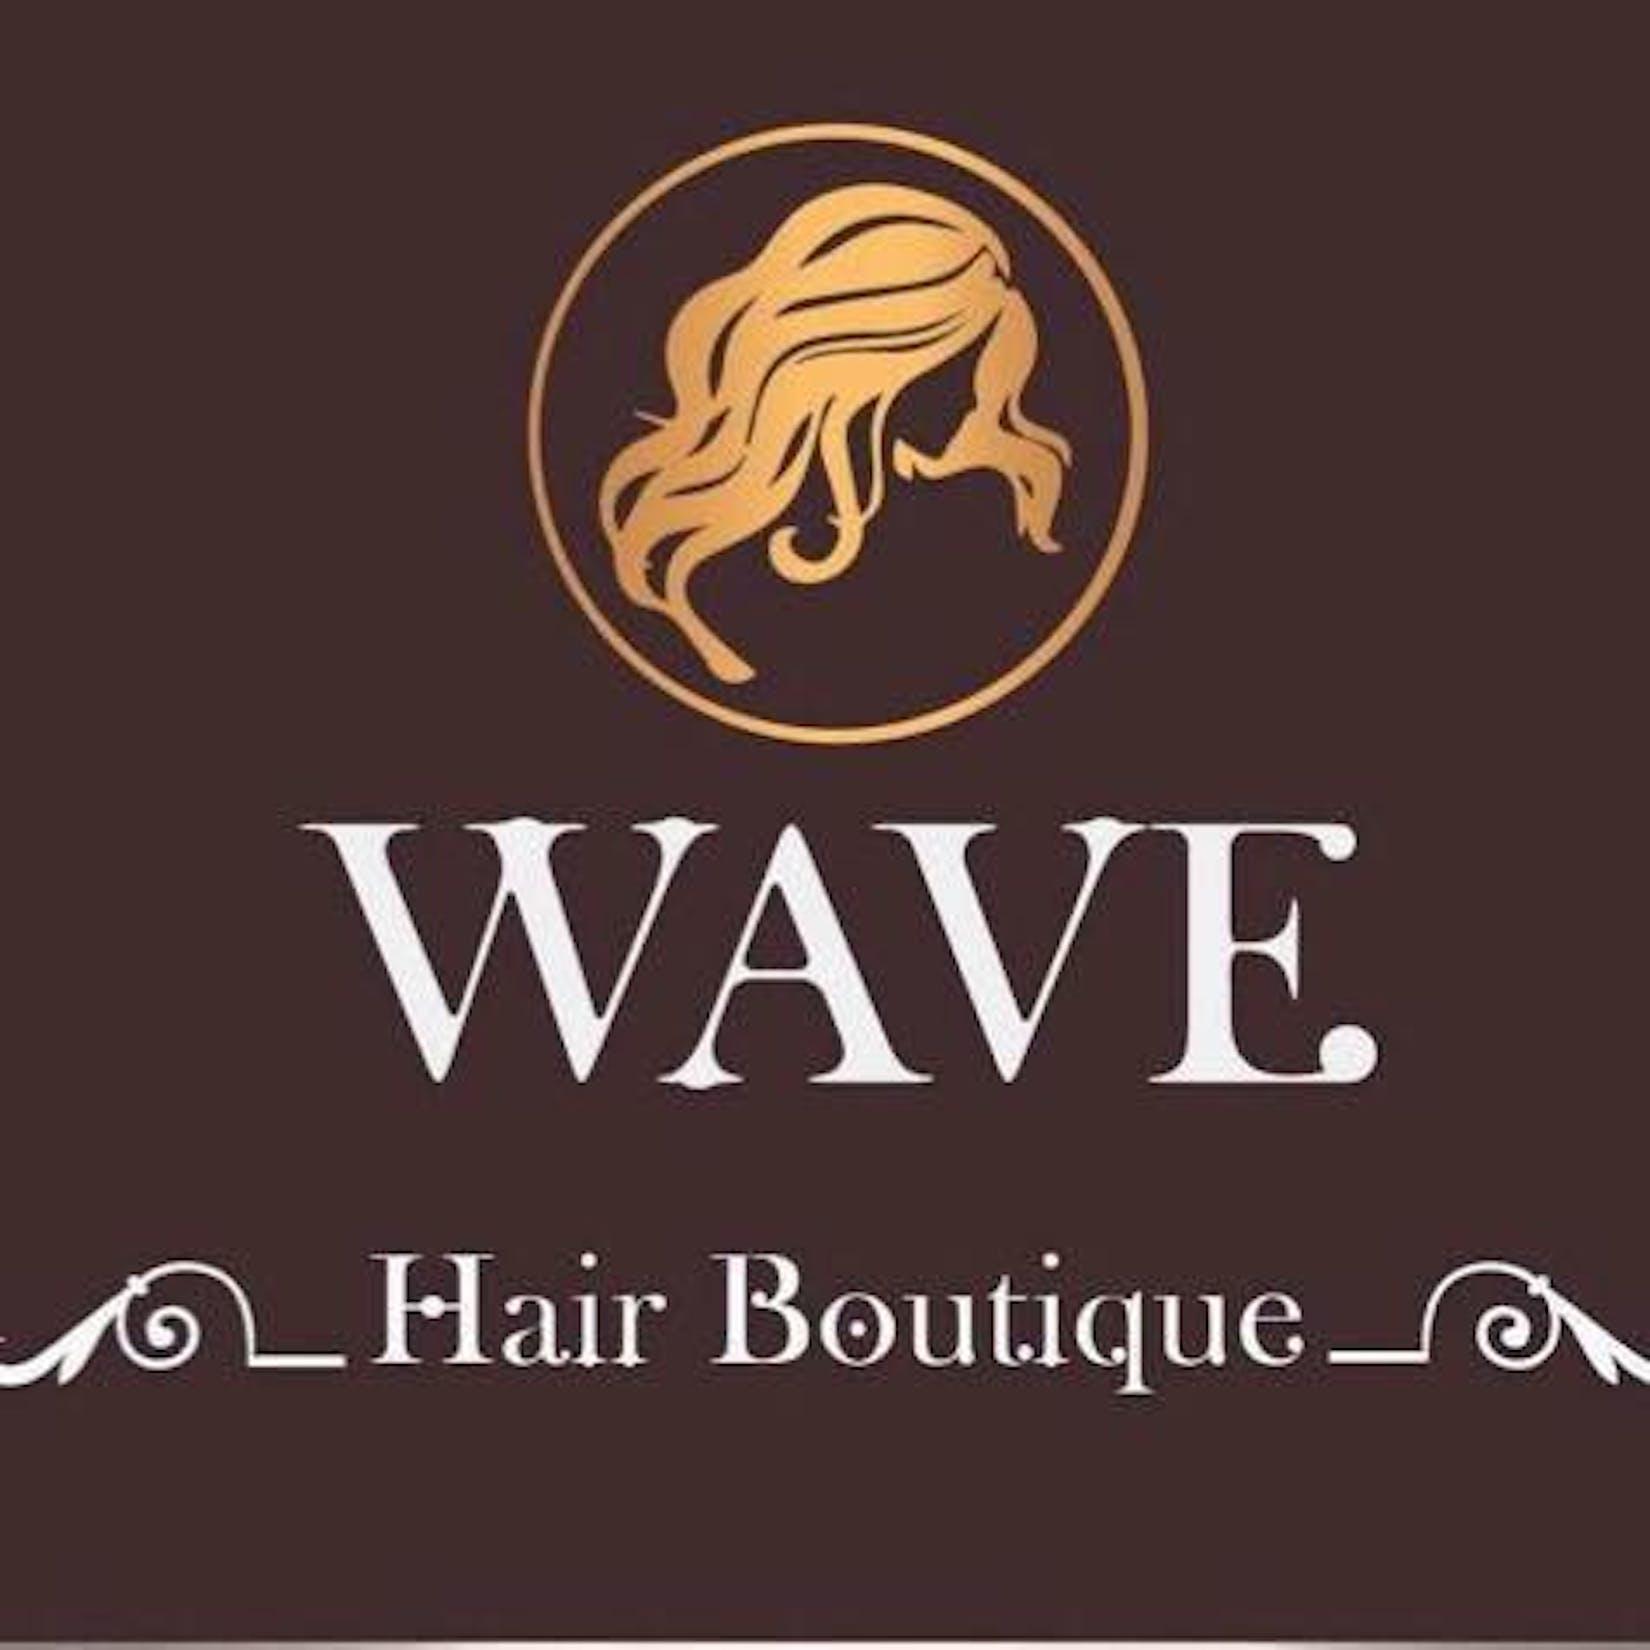 WAVE hair boutique | Beauty